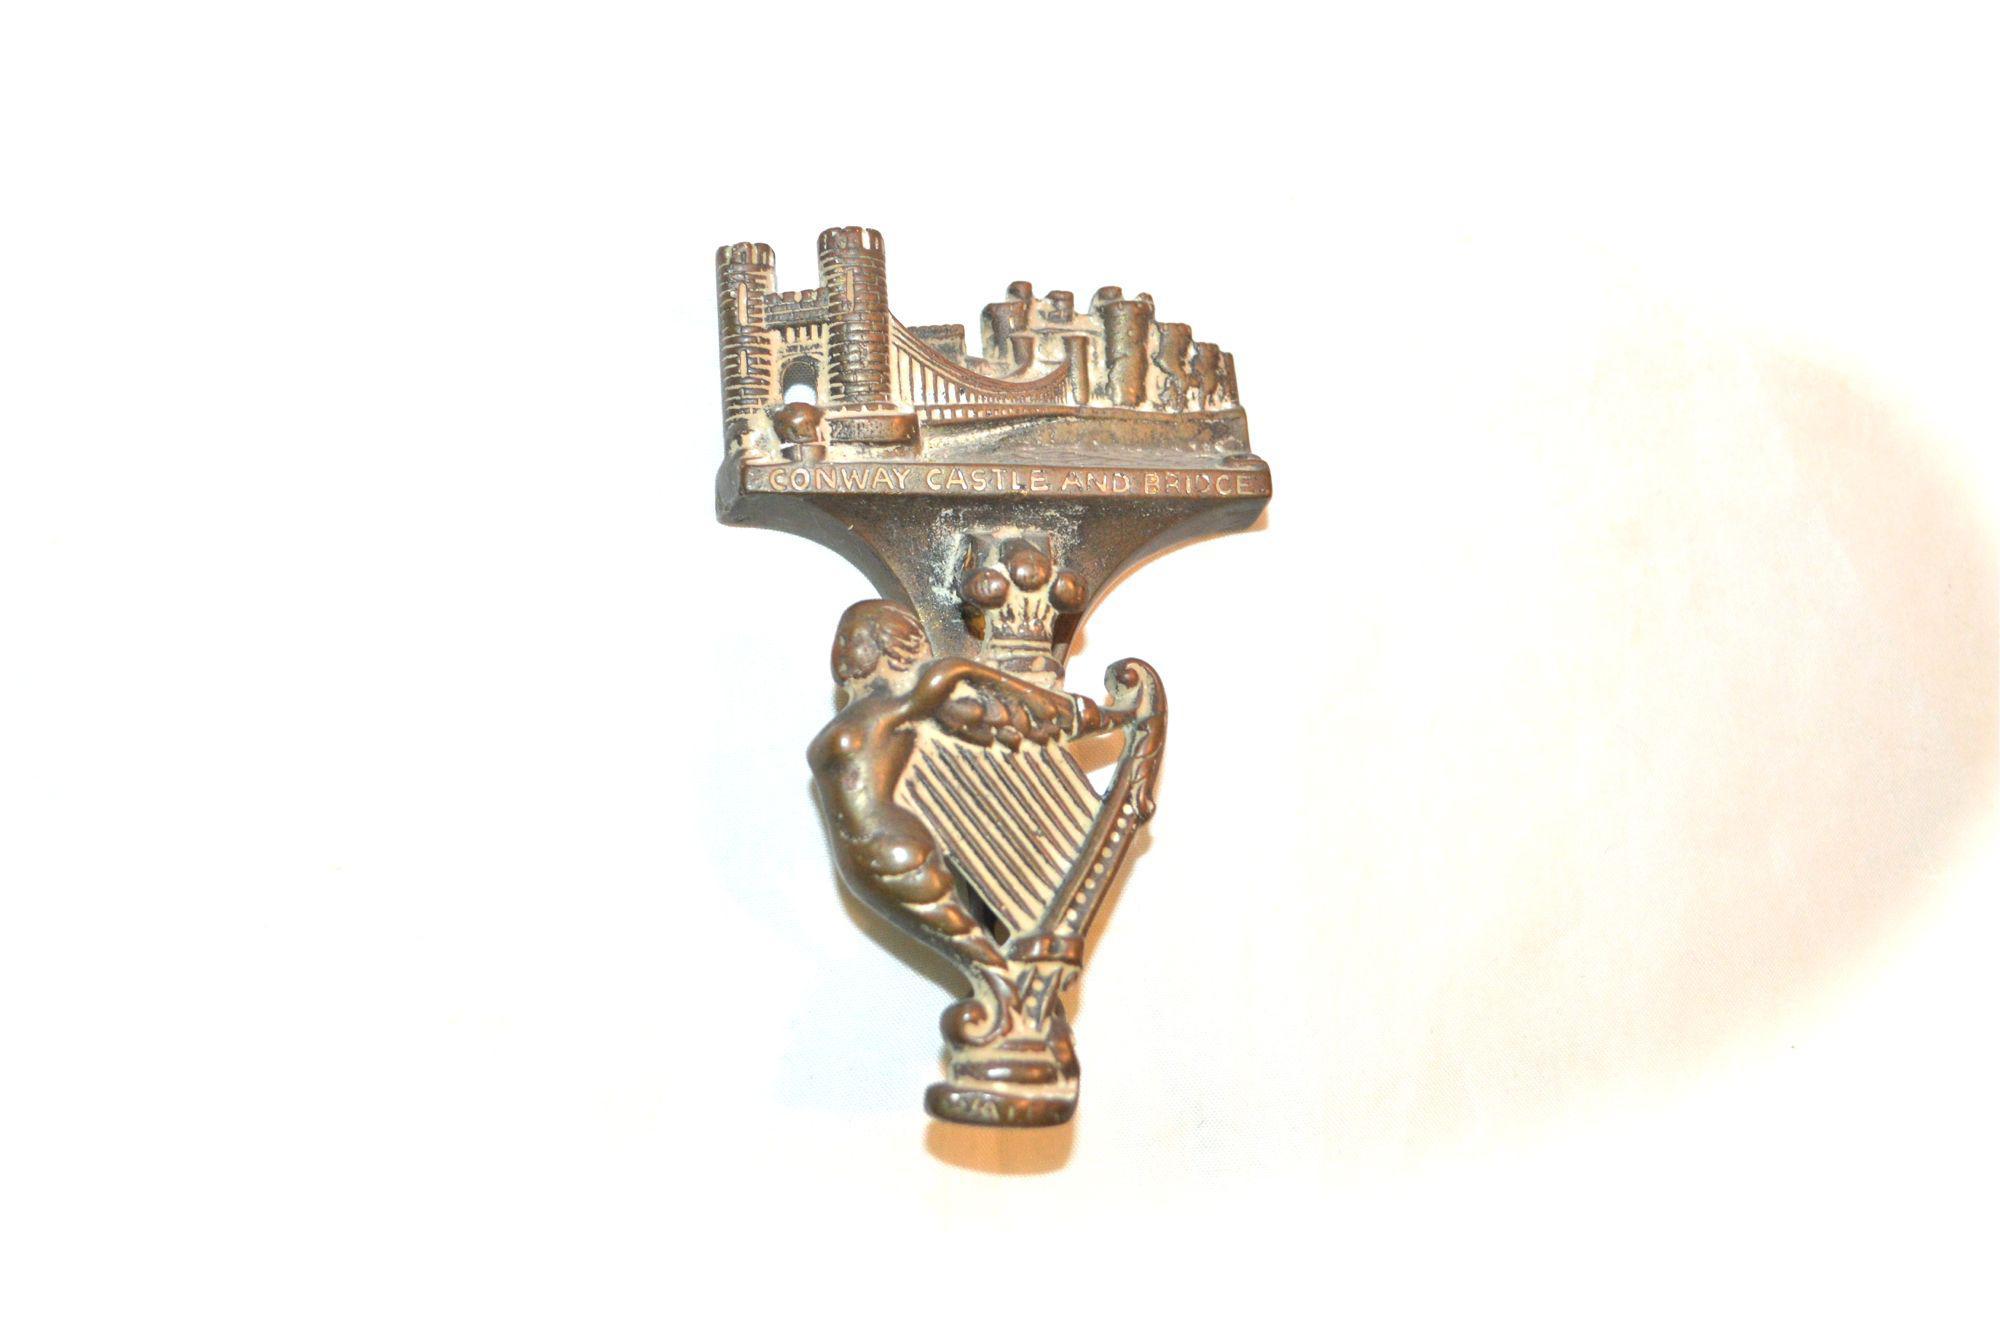 Celtic Harp U0026 Castle Door Knocker For Sale   Image 5 ...